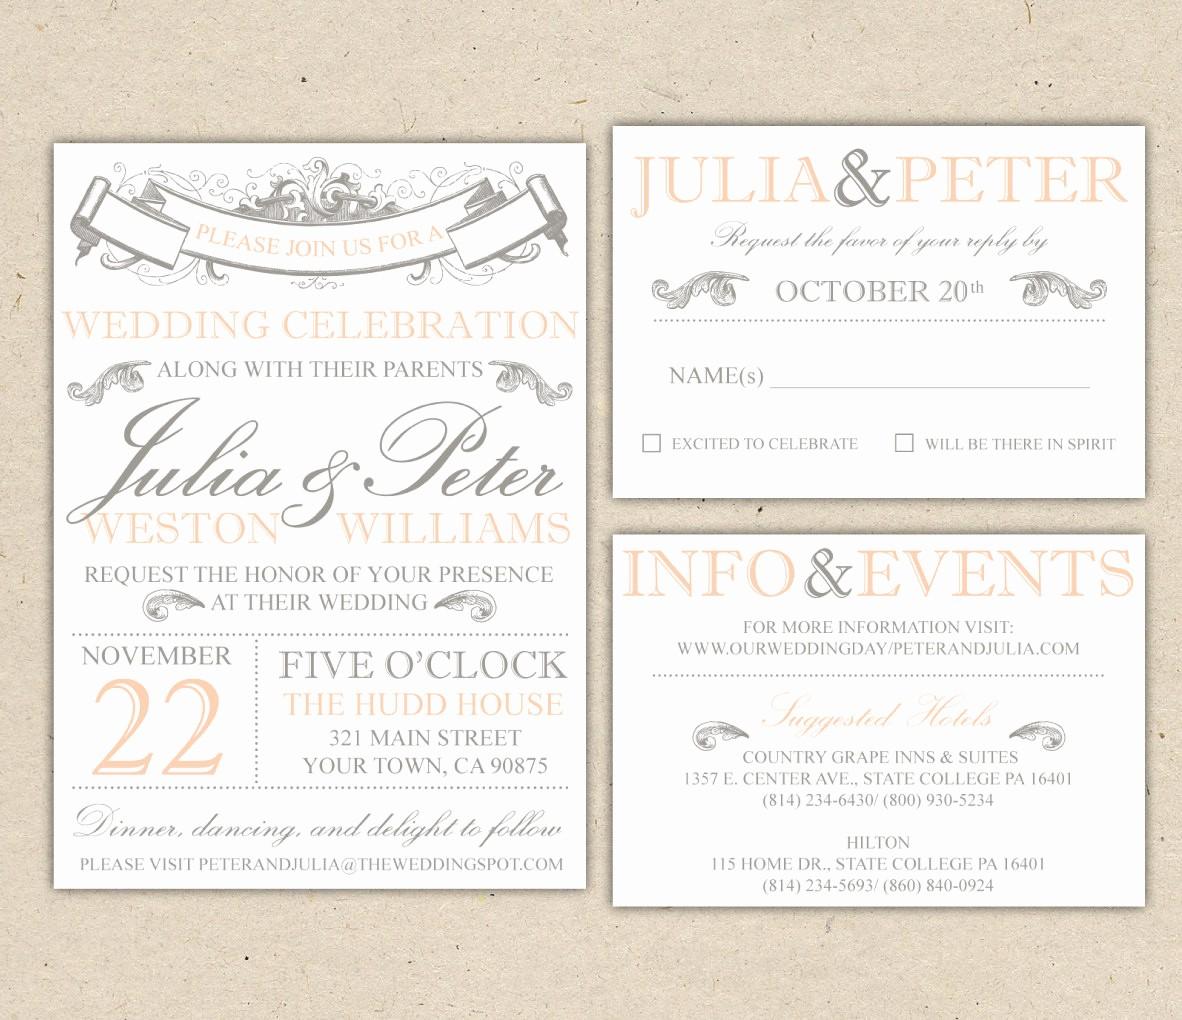 Wedding Invitations Templates Word Free Fresh Free Wedding Invitation Templates for Word